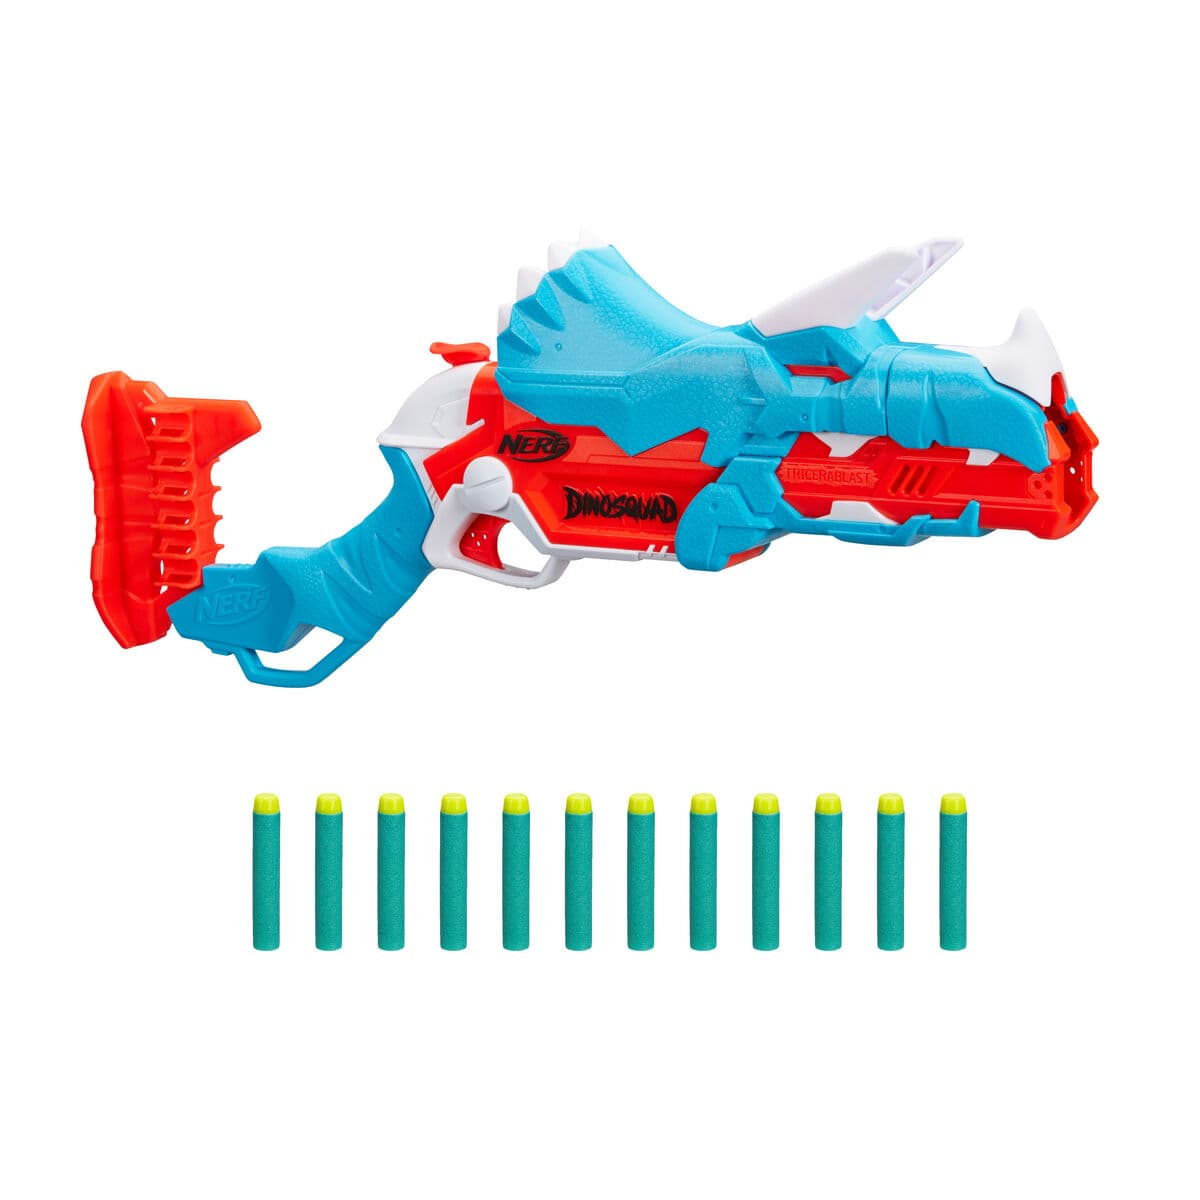 Nerf Tricerablast Blaster